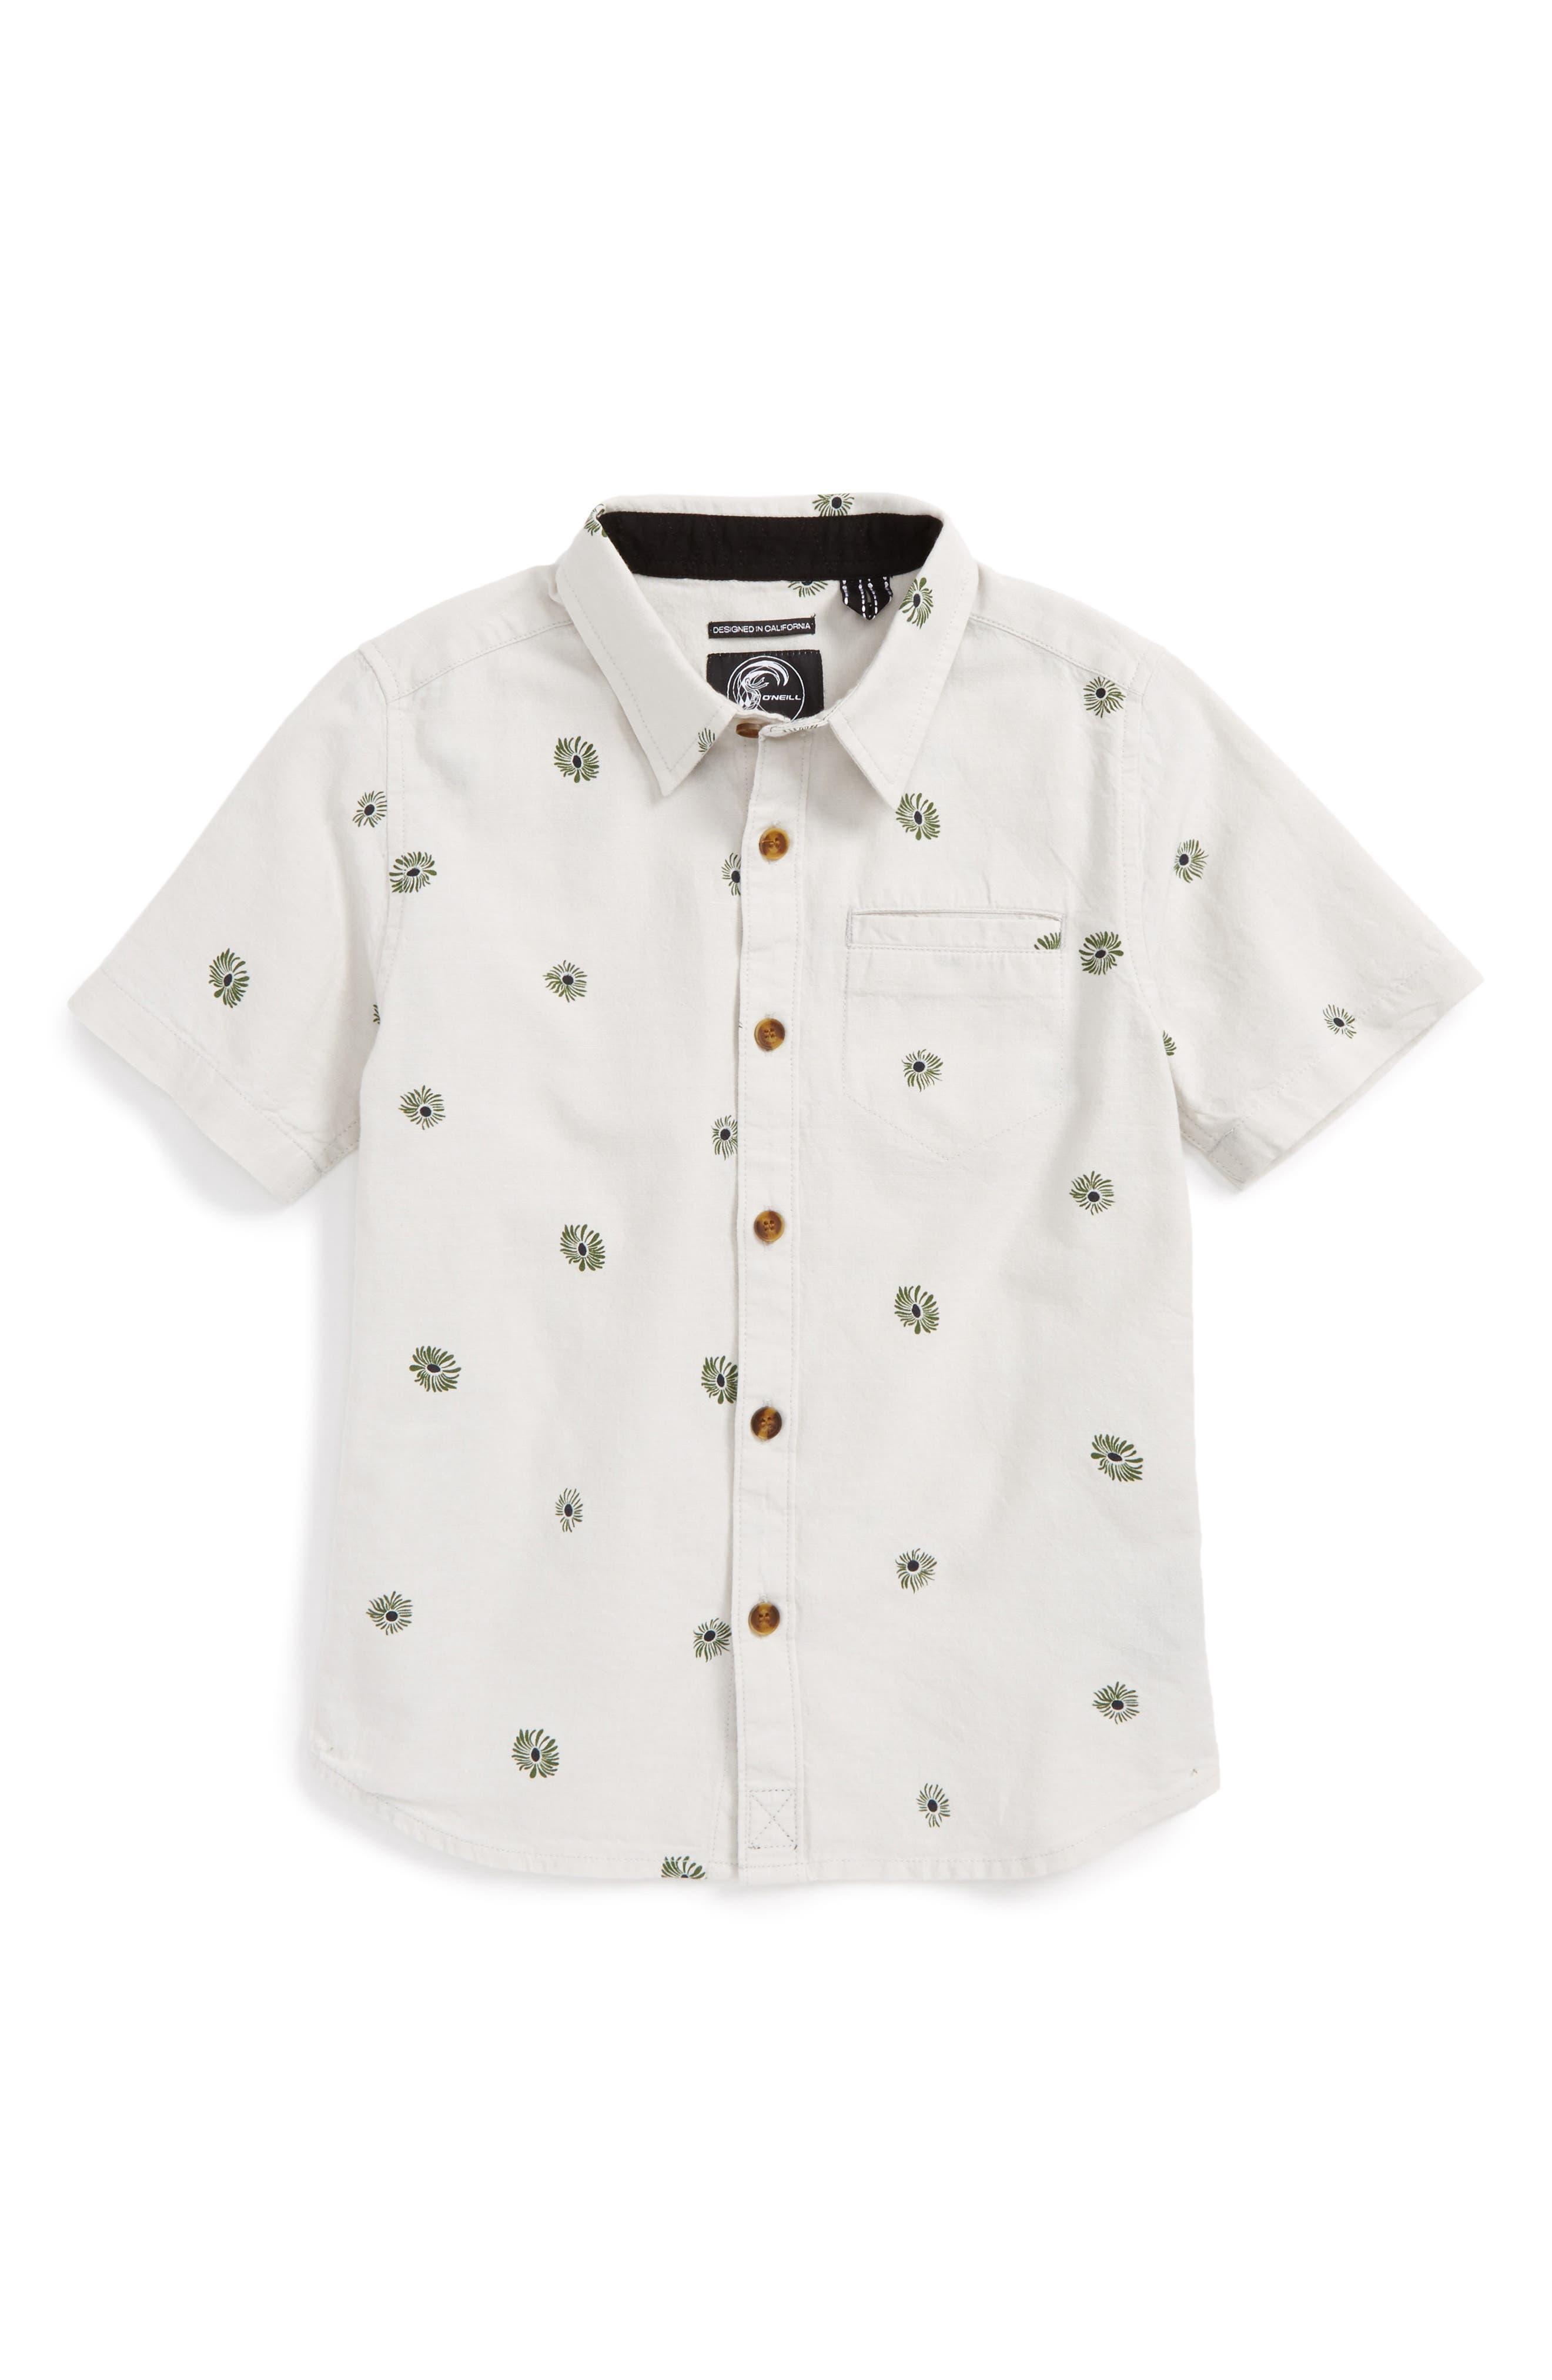 Main Image - O'Neill Brees Short Sleeve Woven Shirt (Little Boys)